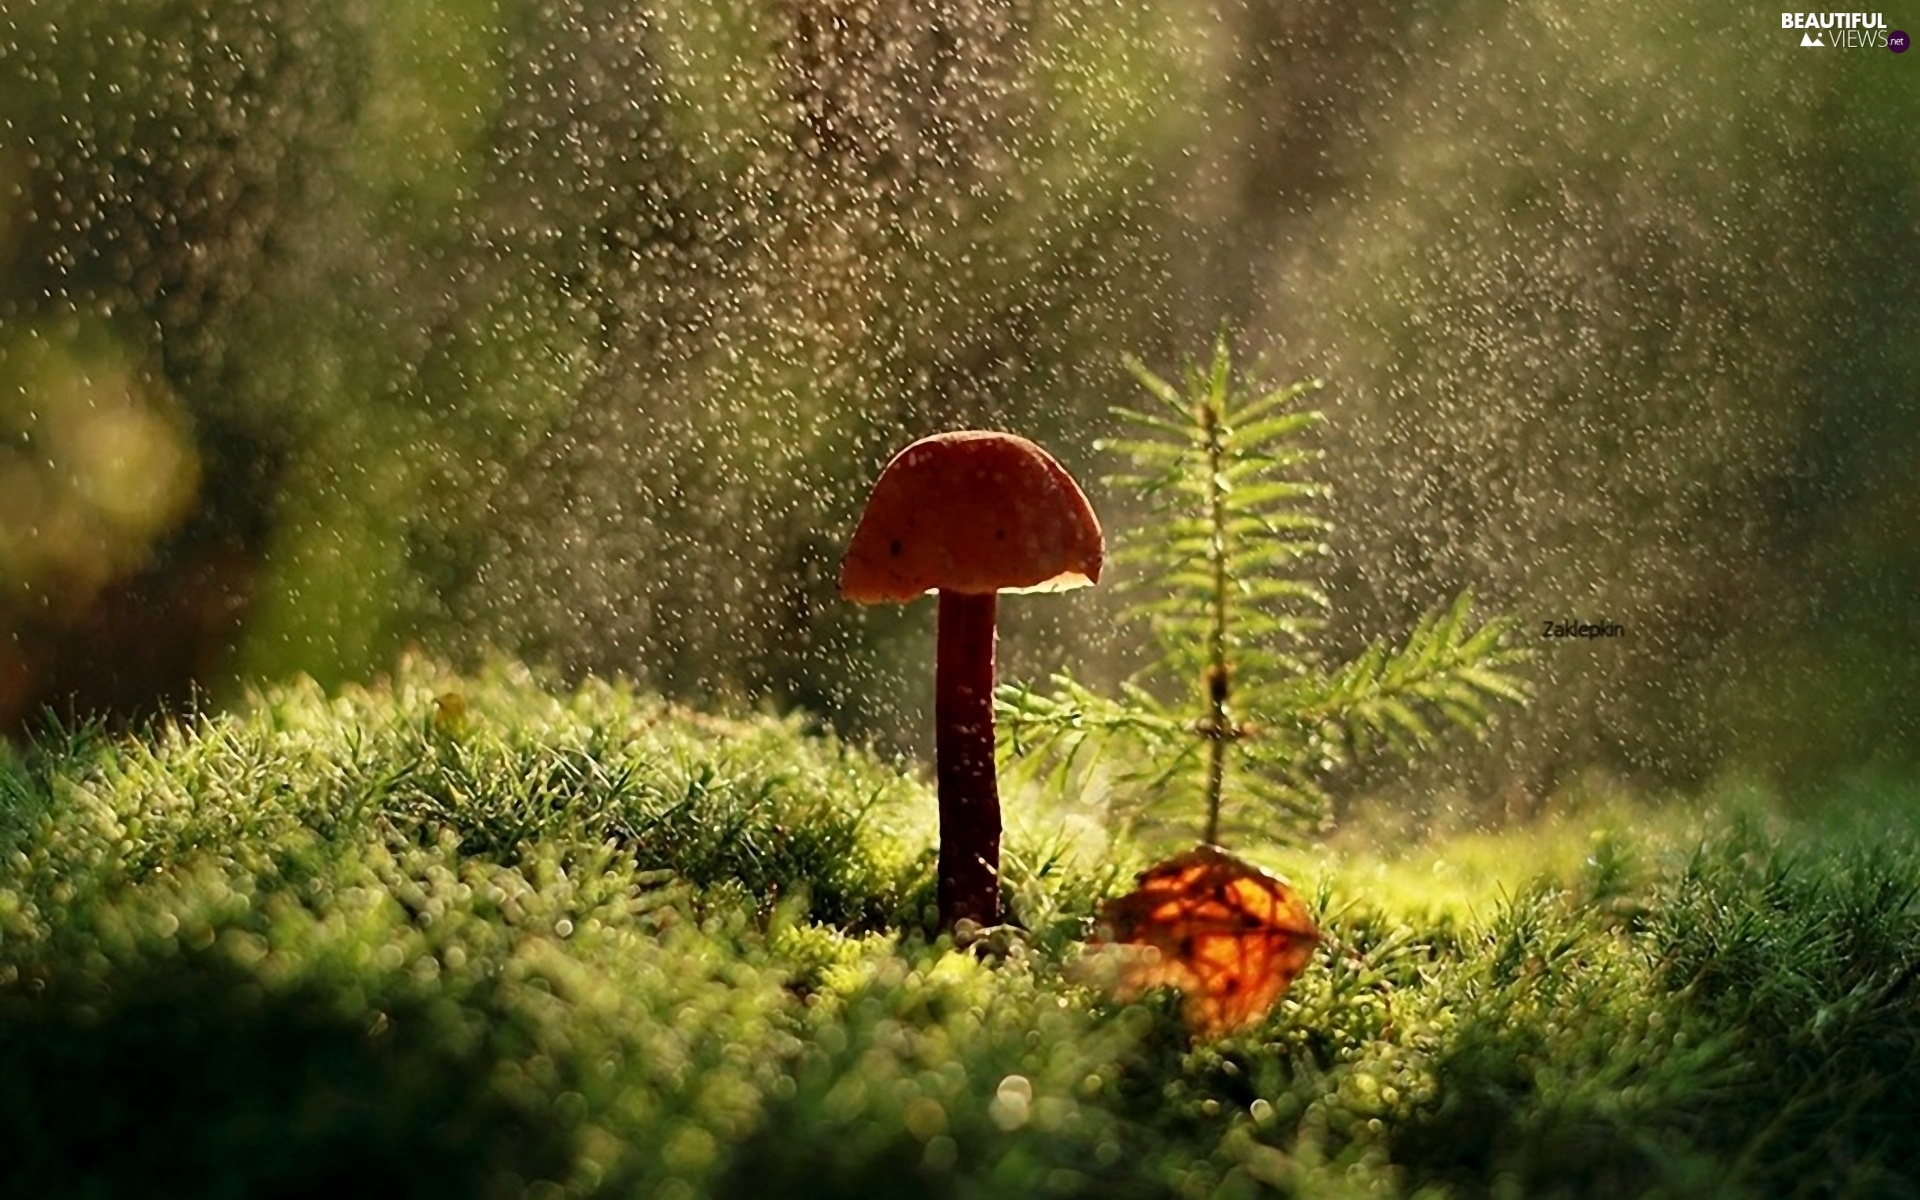 Free Animated Frog Wallpaper Ligh Forest Flash Rain Mushrooms Sun Luminosity